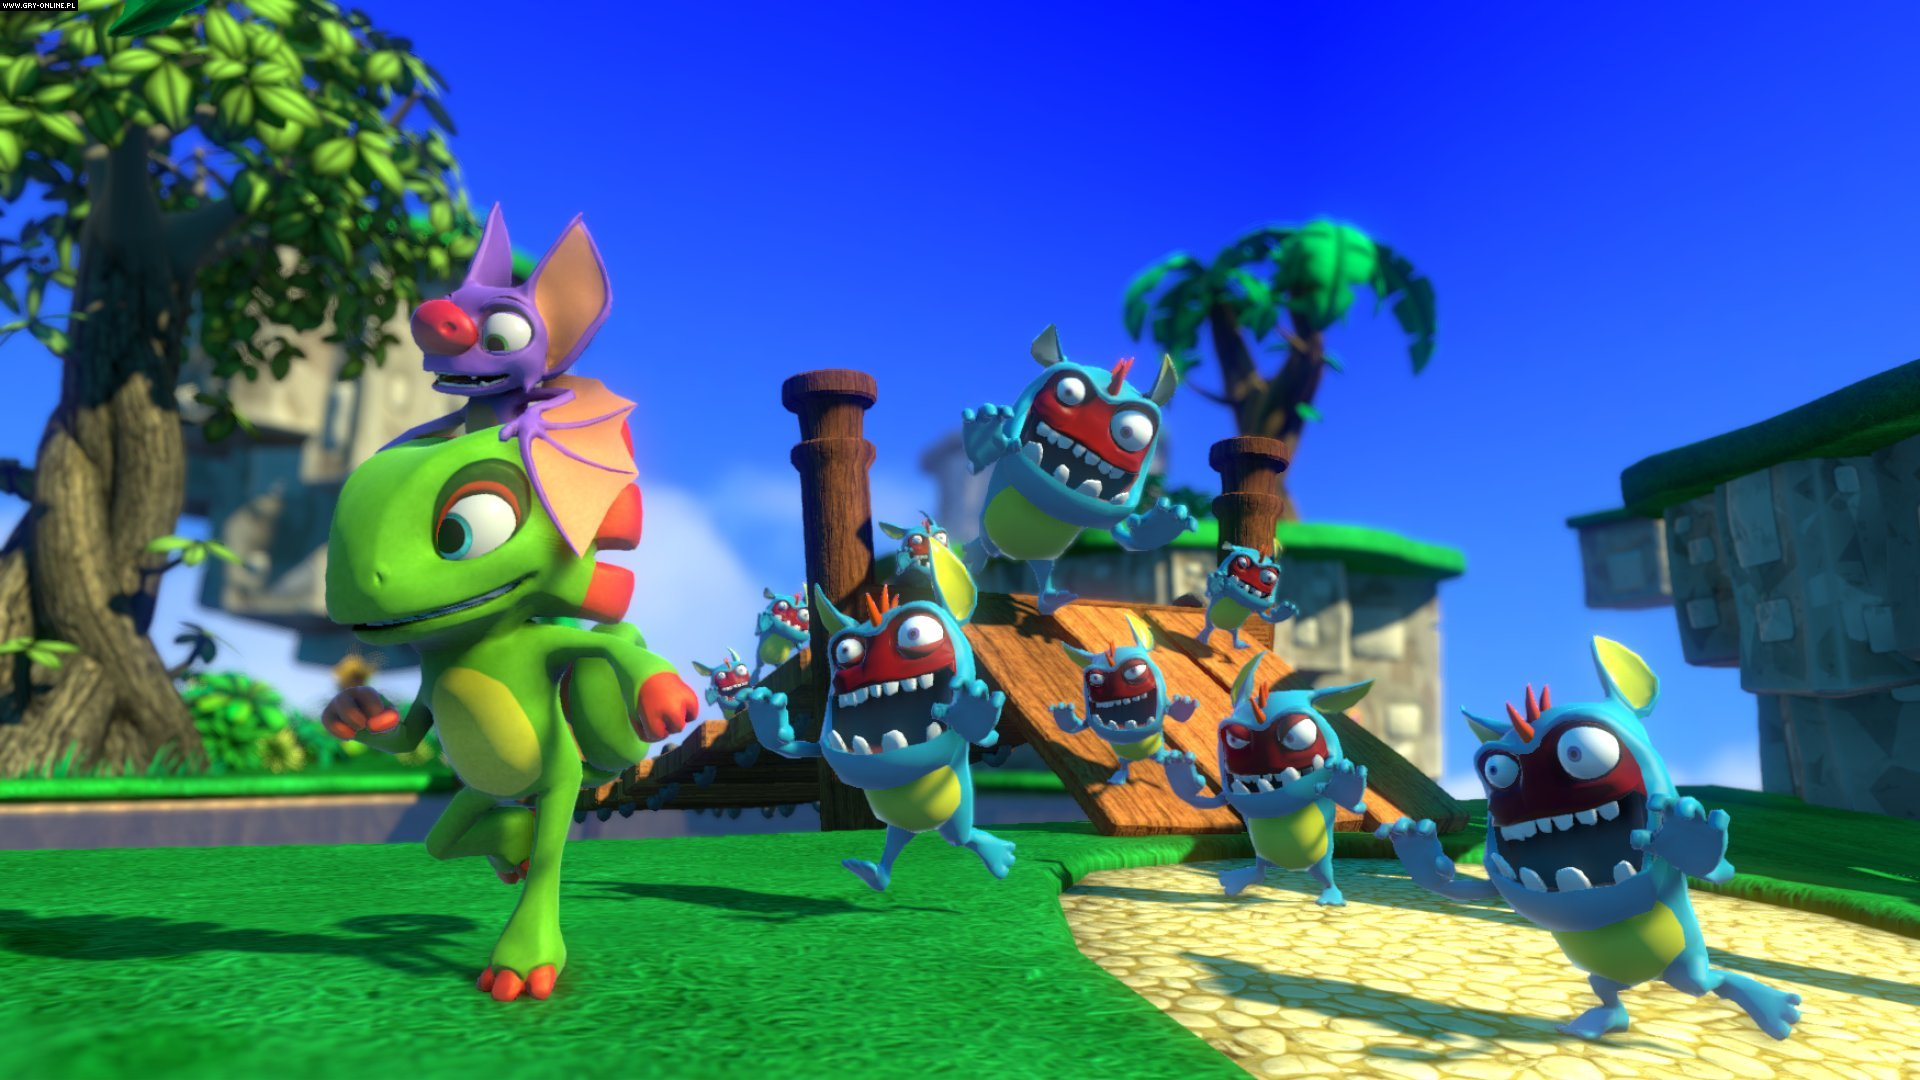 Yooka-Laylee PC, WiiU, XONE, PS4 Games Image 16/30, Playtonic Games, Team 17